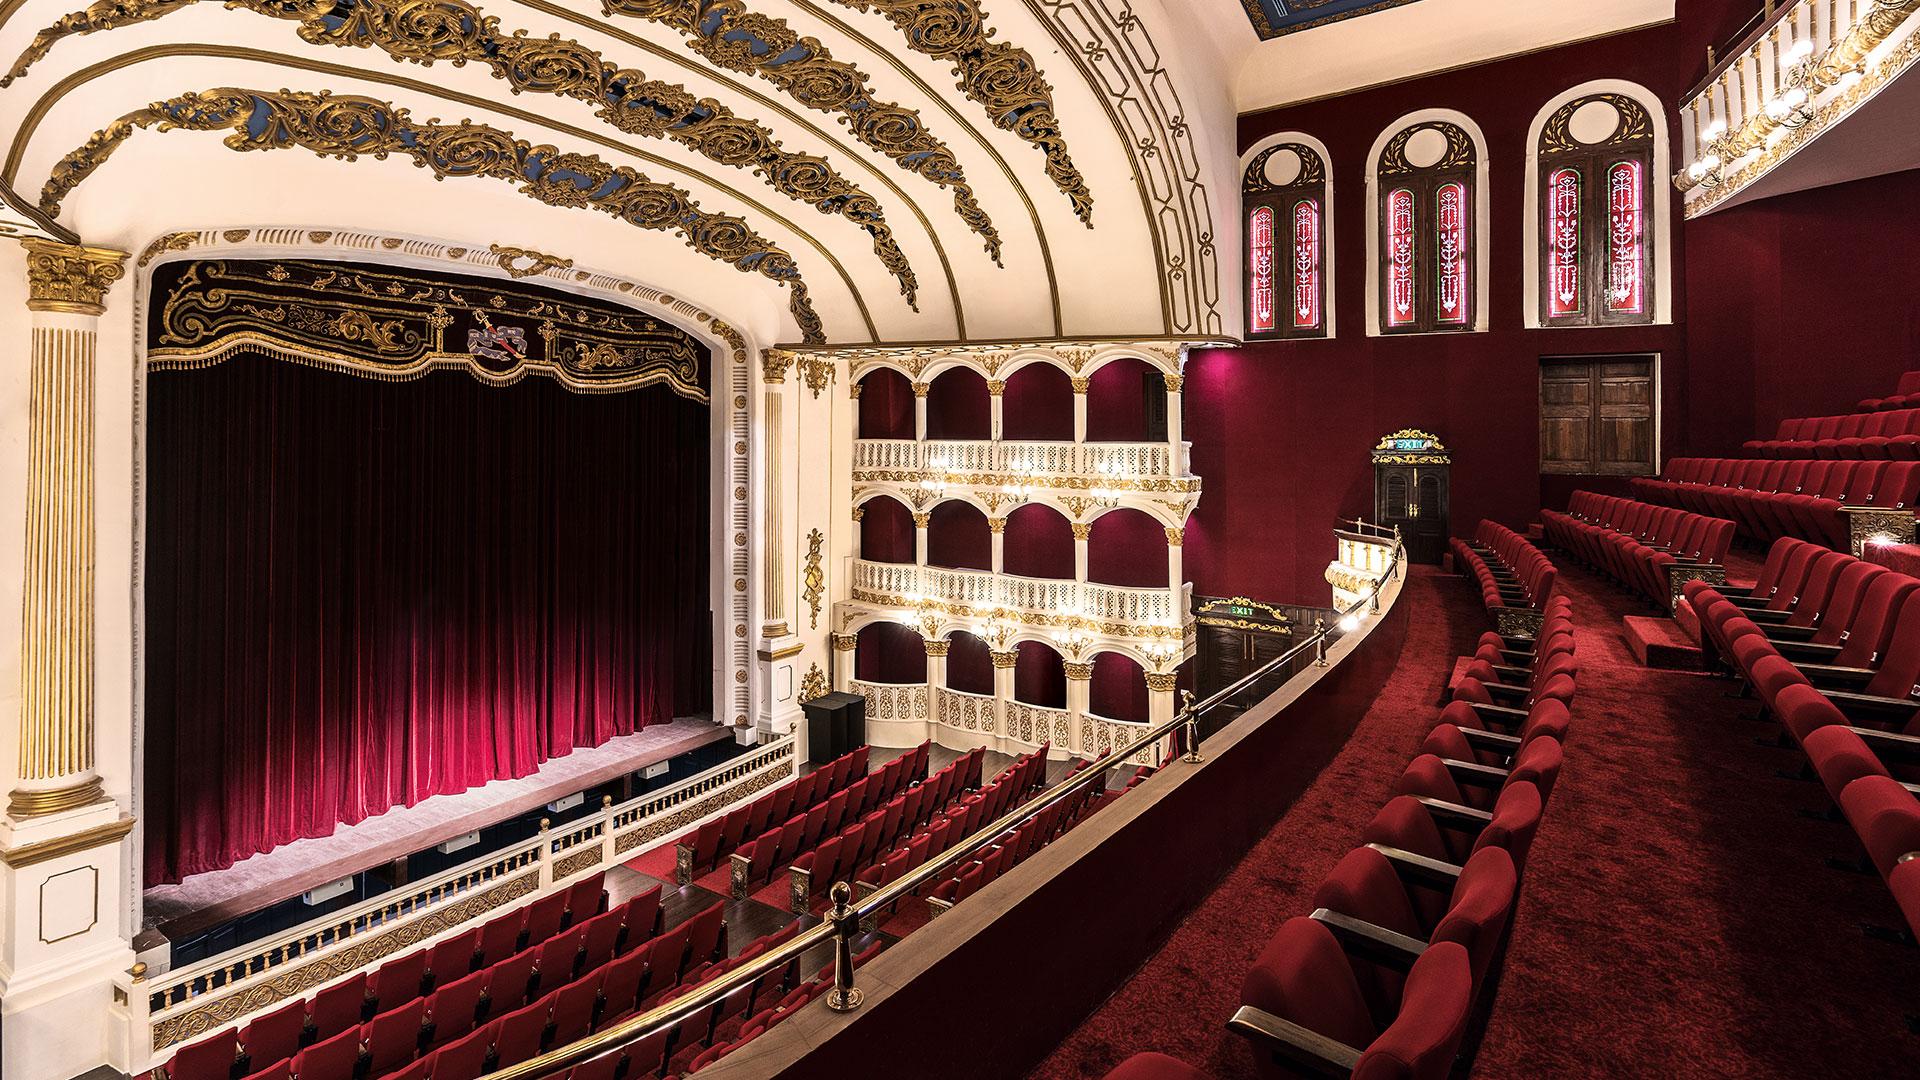 royal opera house mumbai.jpg